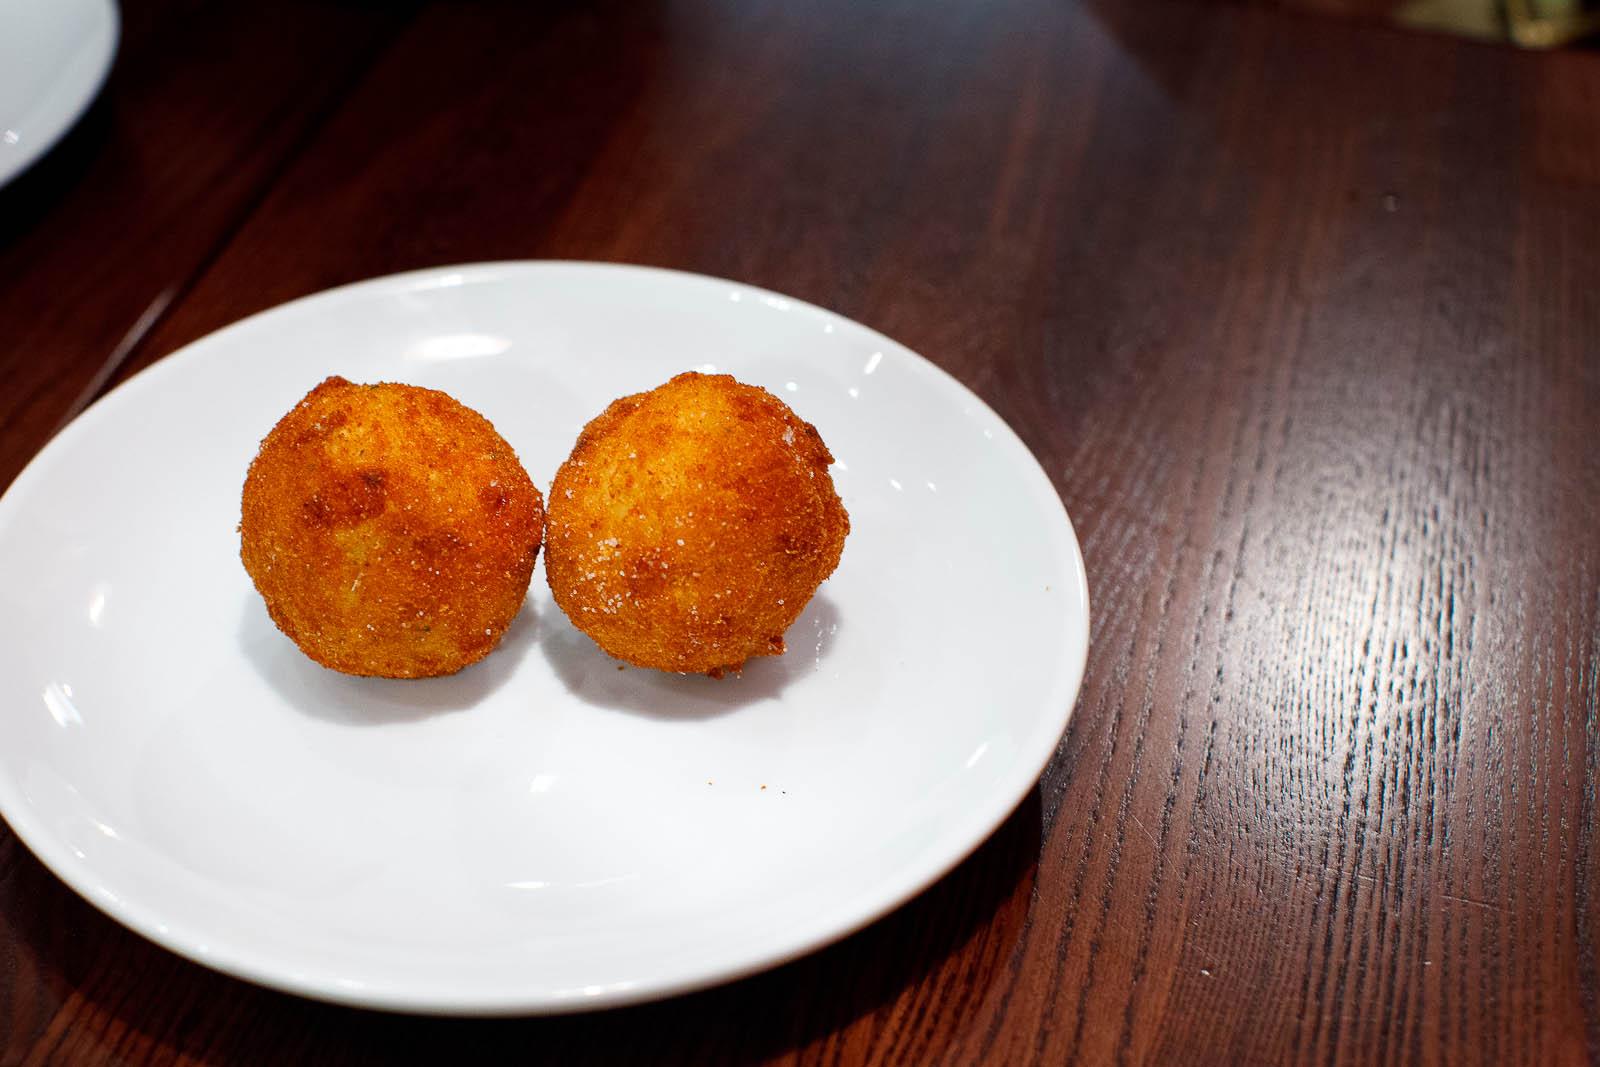 Arancini - the classic Neapolitan rice ball ($2.50 / each)